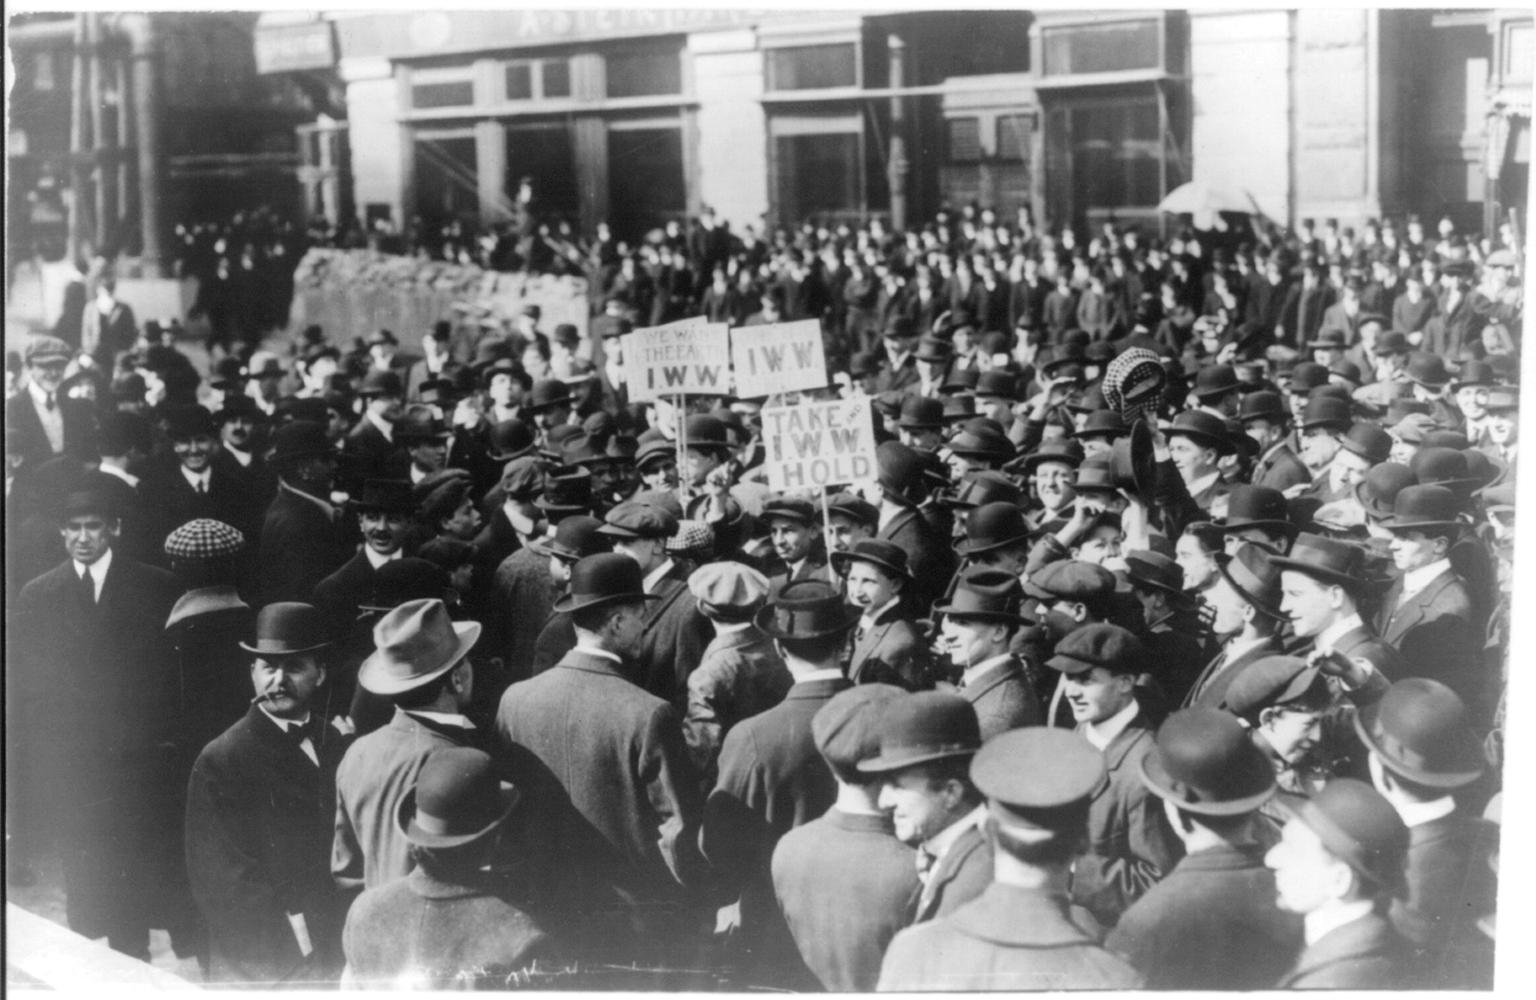 iww_demonstration_ny_1914